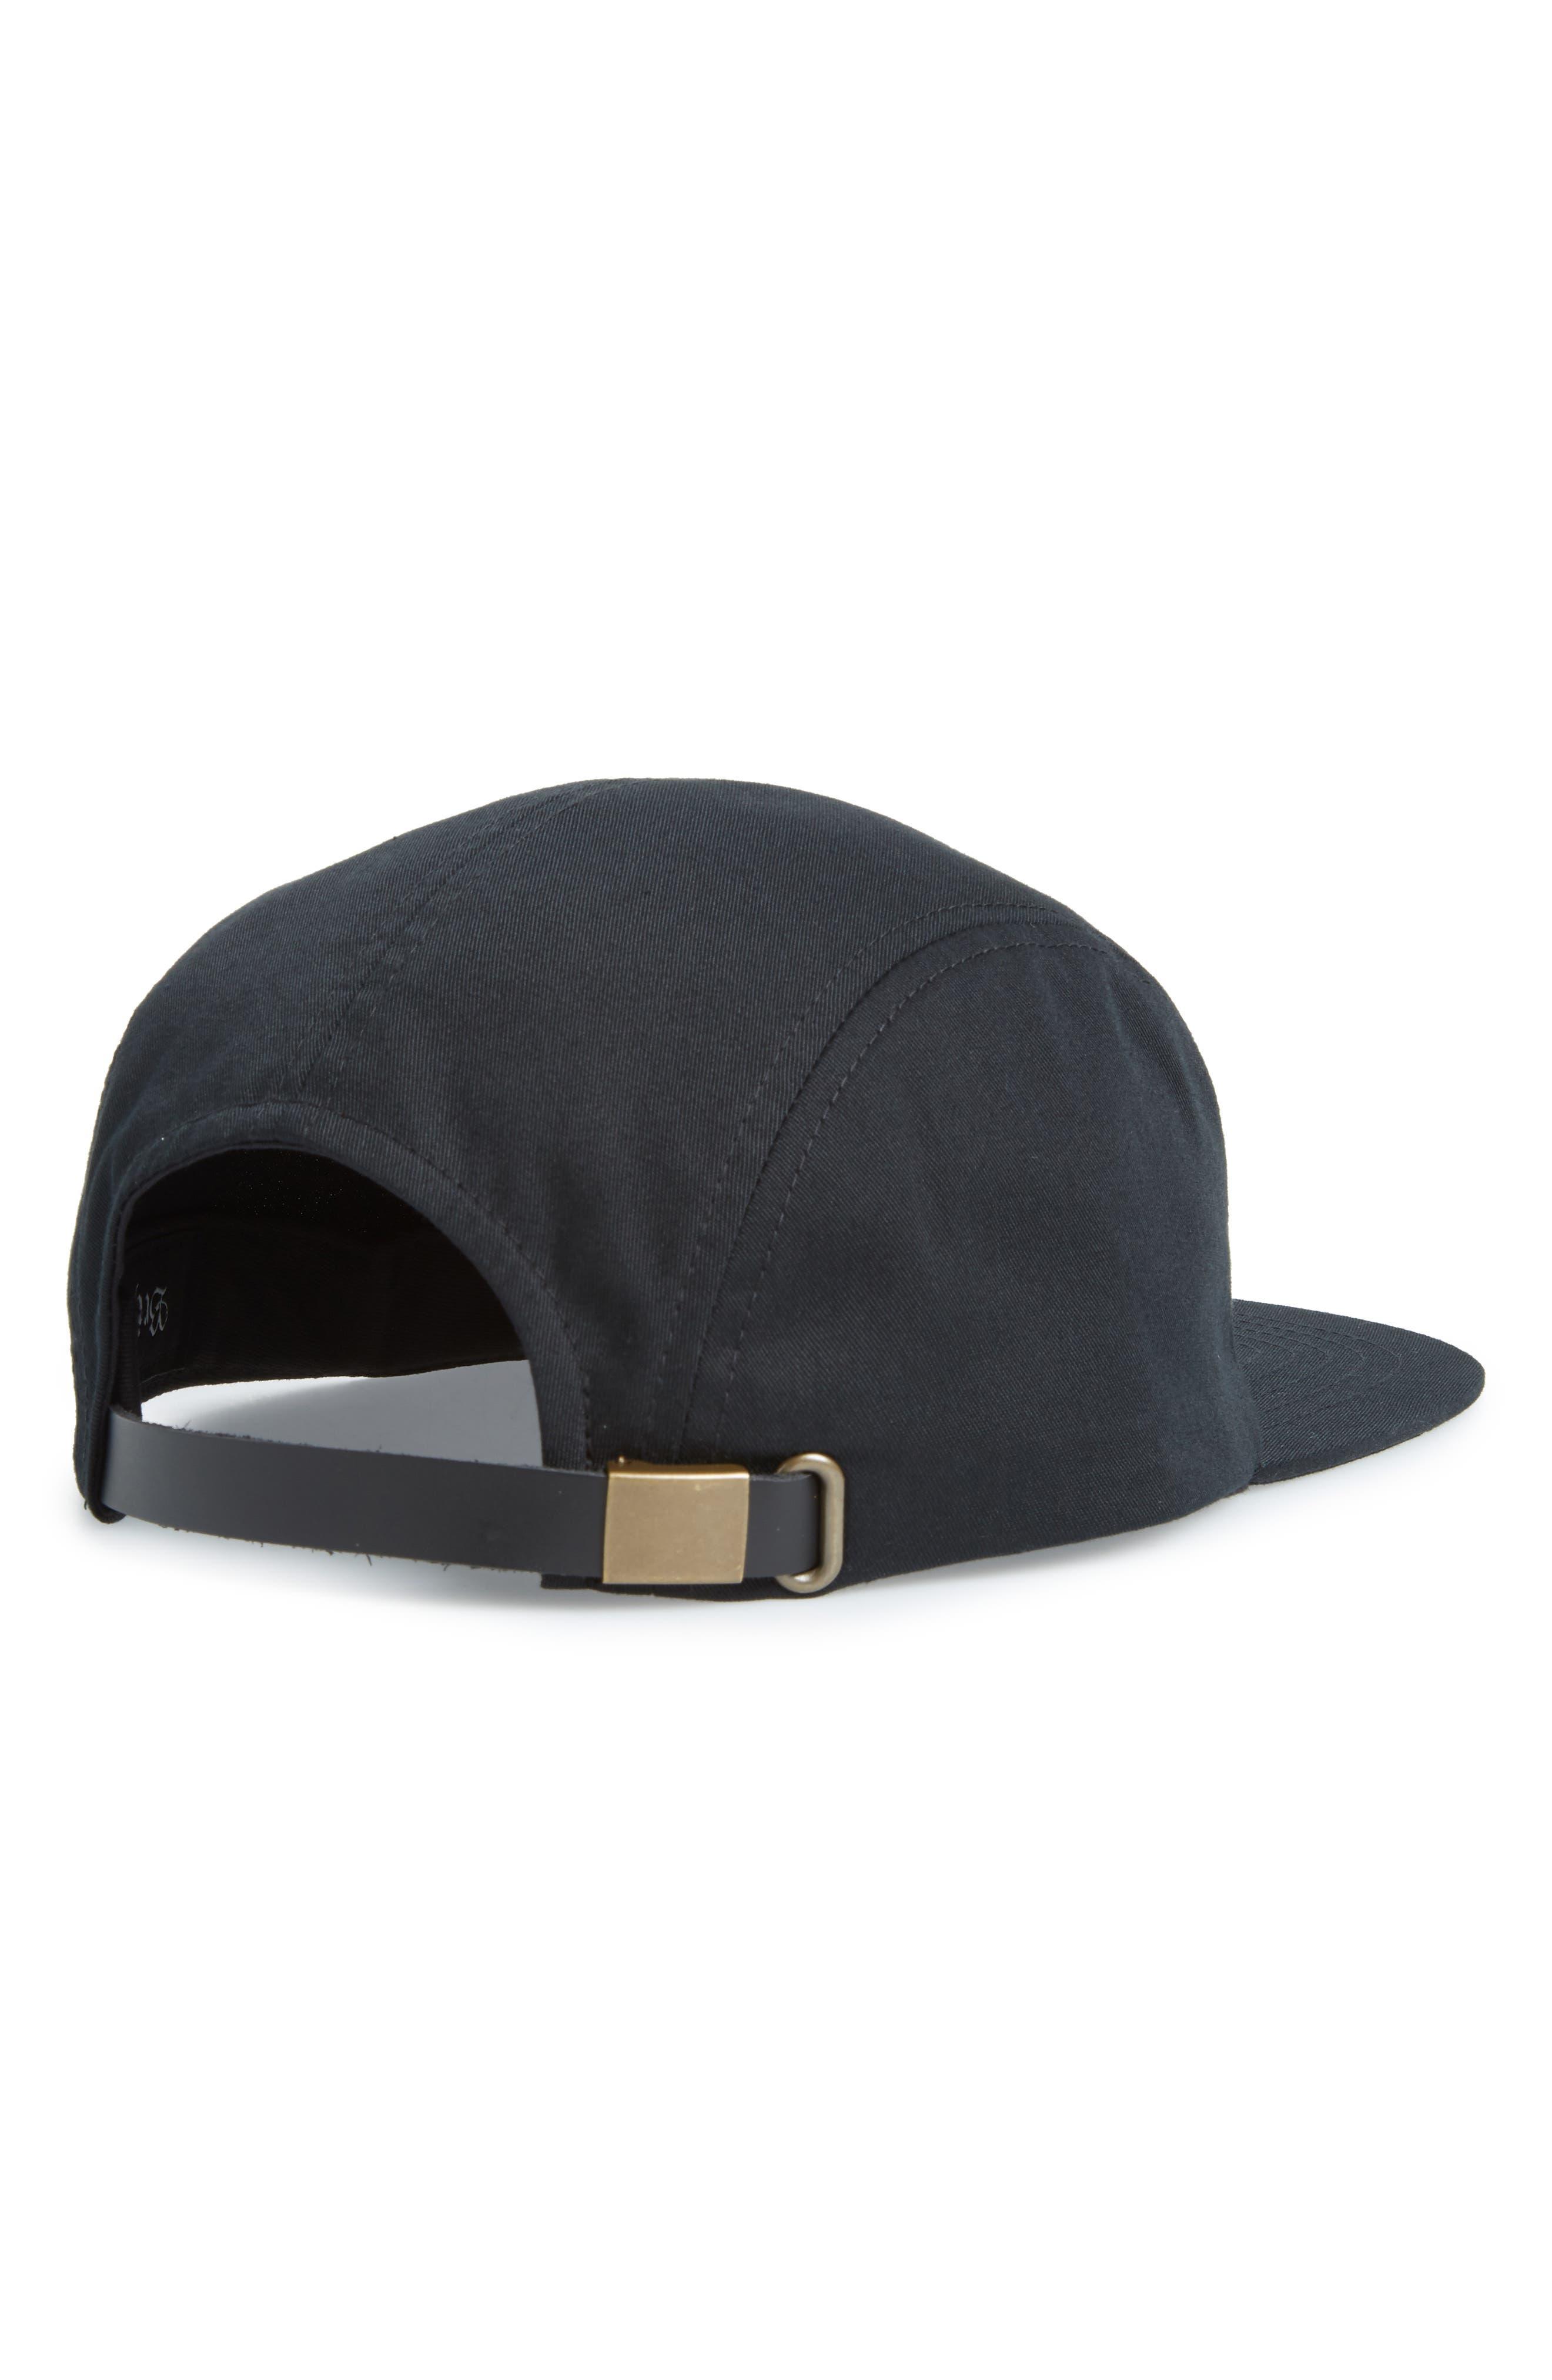 Stowell Baseball Cap,                             Alternate thumbnail 2, color,                             BLACK